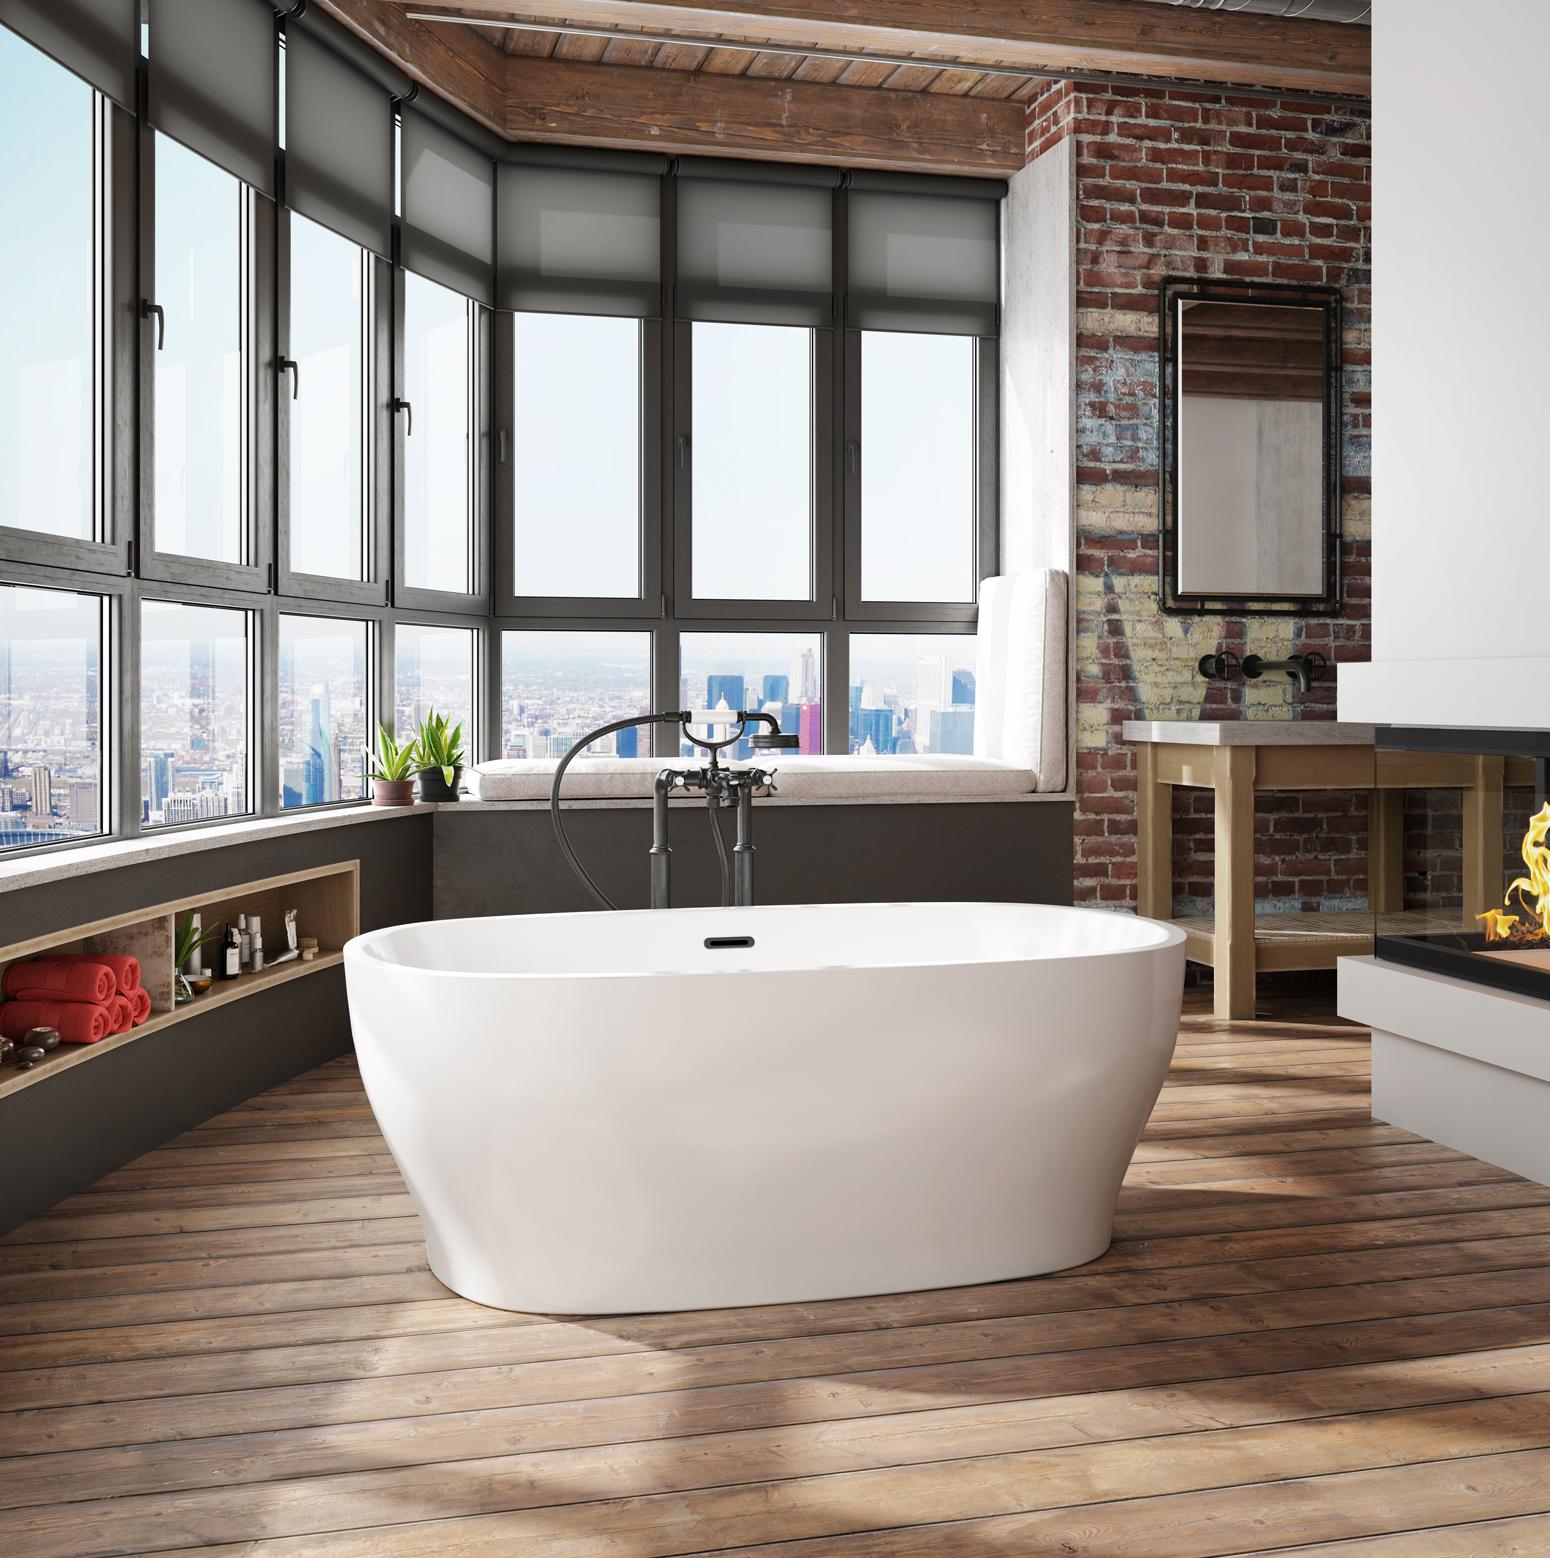 Bainultra Vibe Oval 5830 freestanding air jet bathtub for your modern bathroom